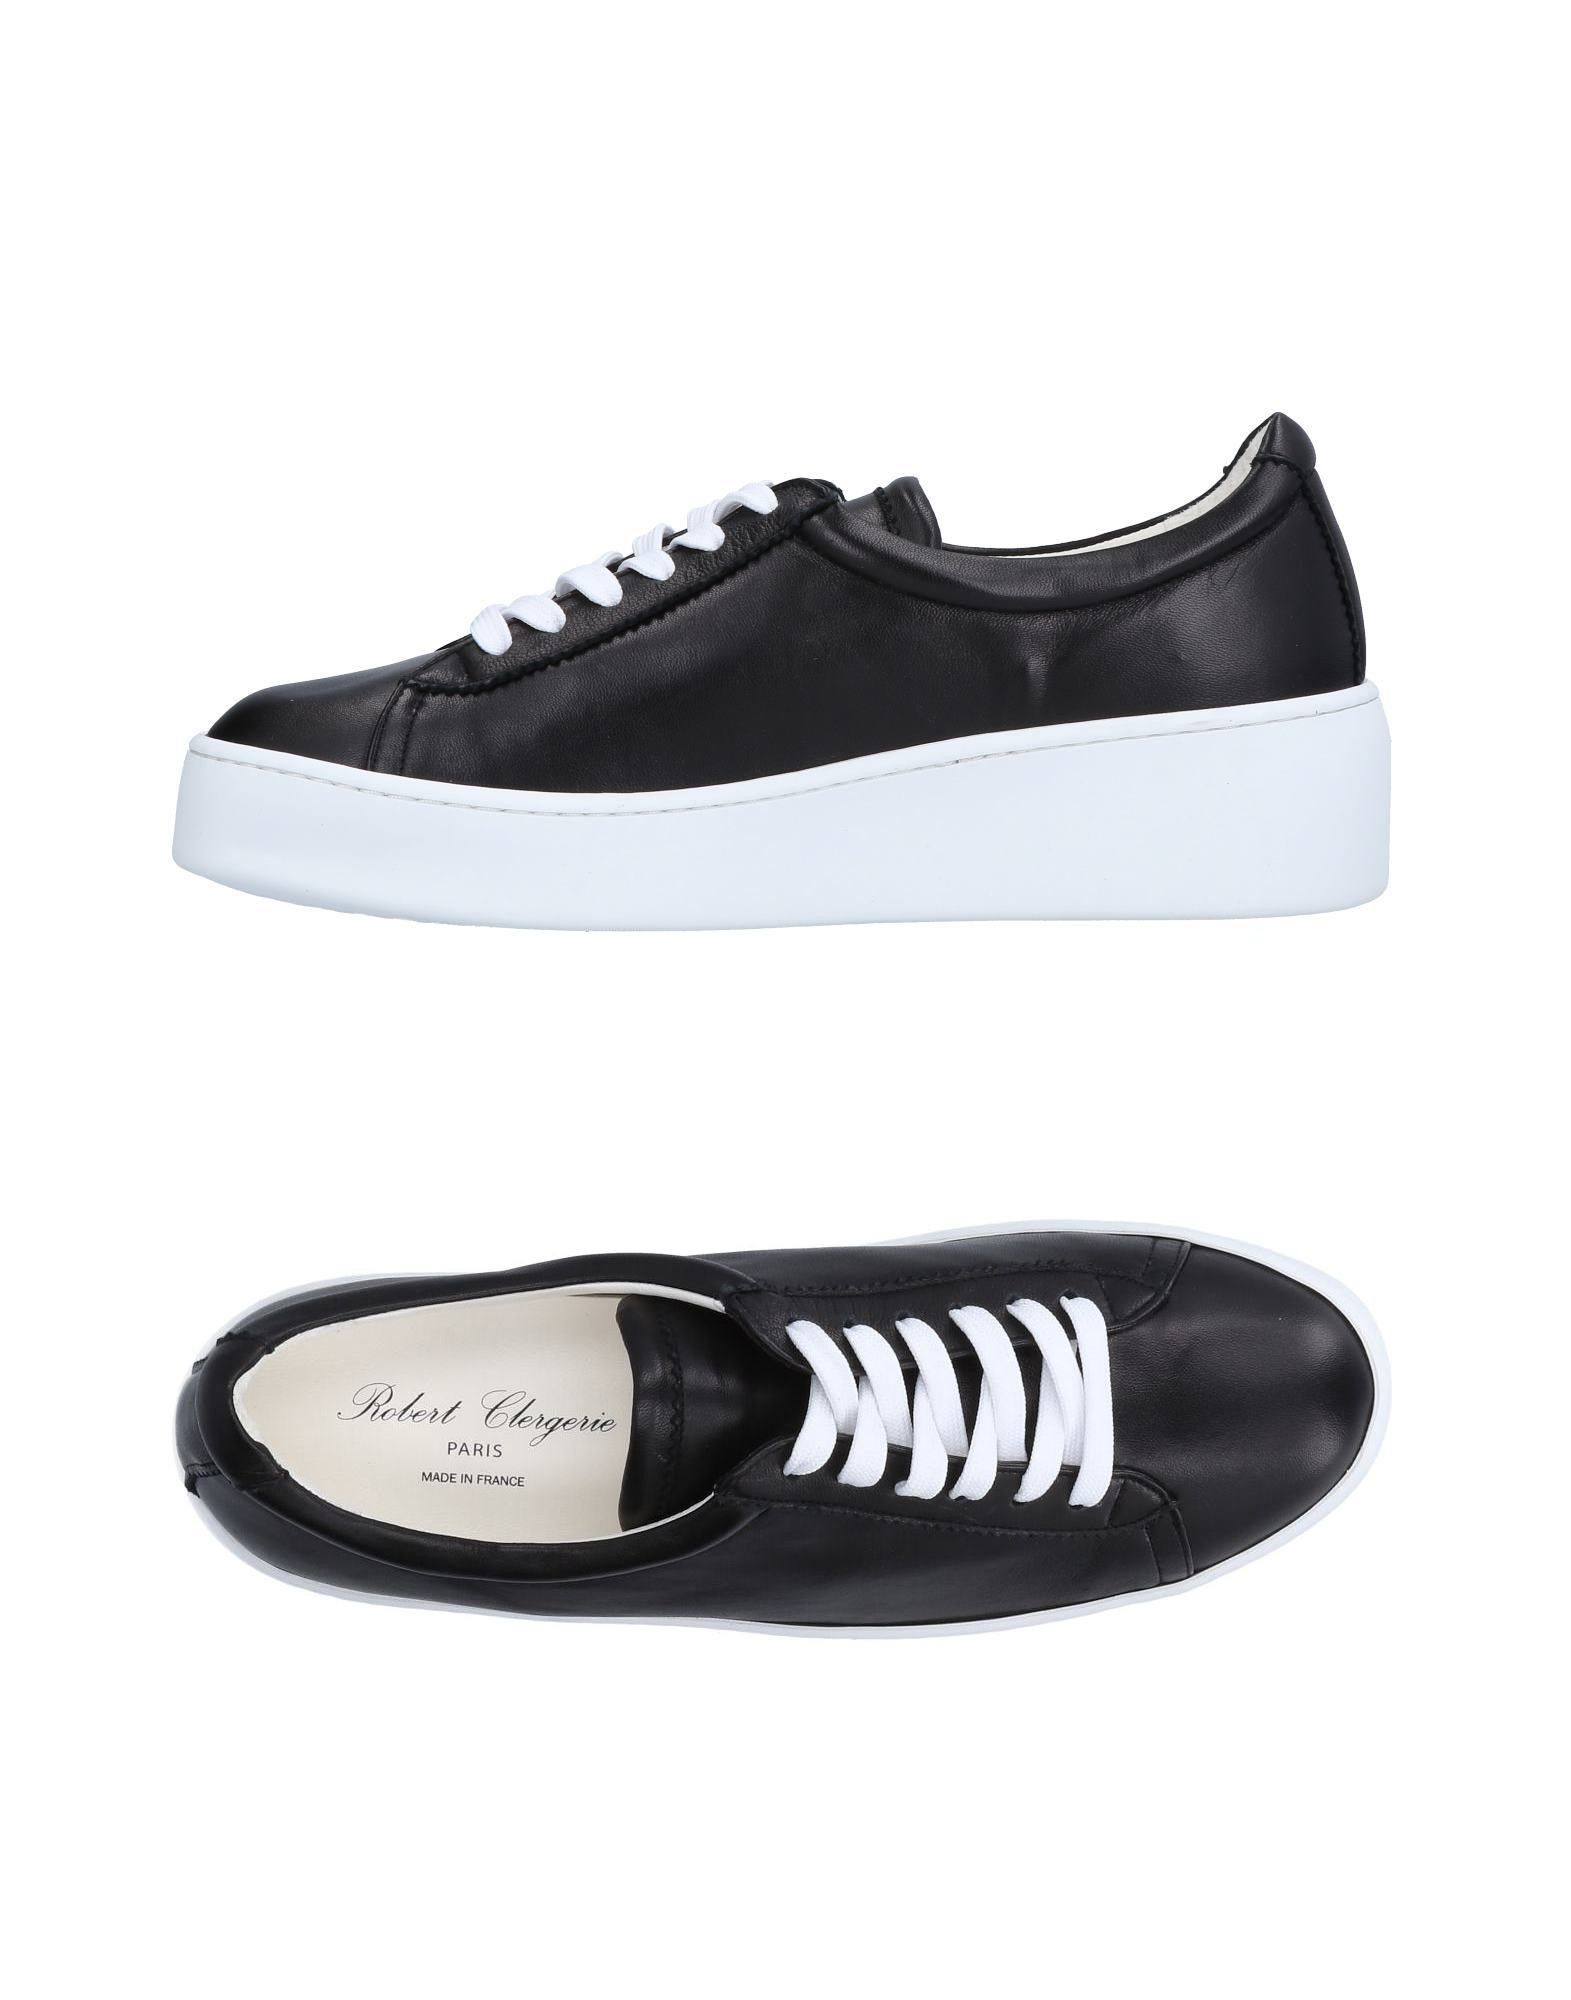 Rabatt Schuhe Robert Clergerie Sneakers Damen  11503304VH